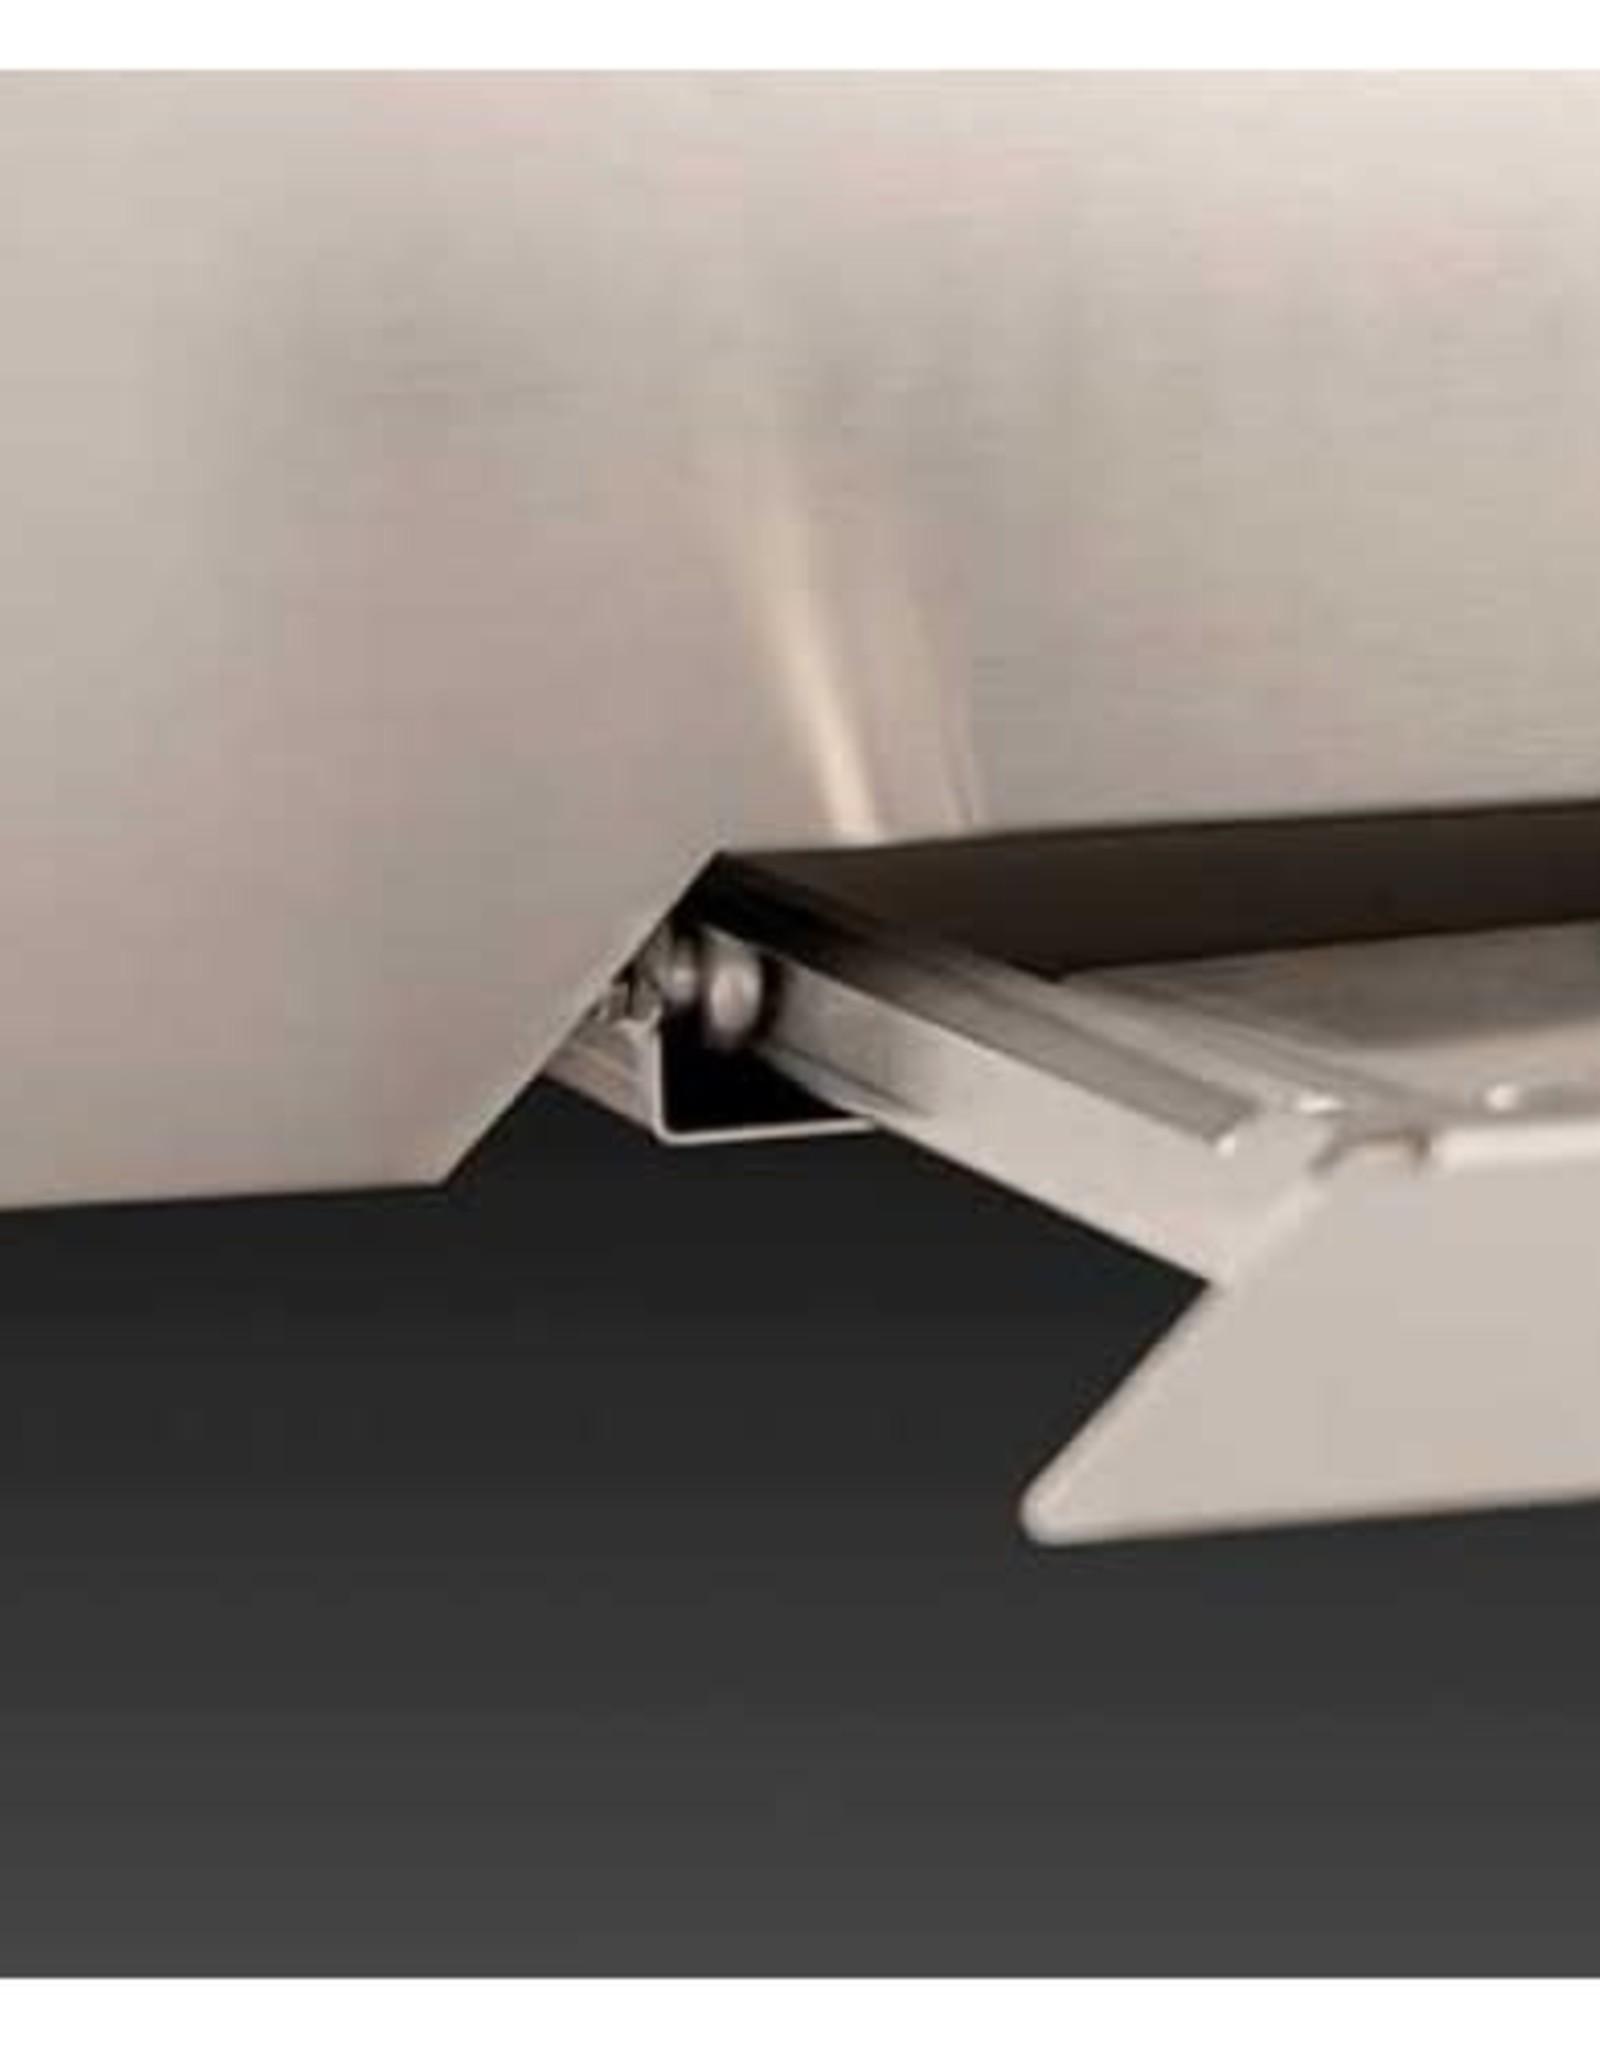 Fire Magic Fire Magic - Echelon Diamond E660i 30-inch Built-In Grill (Analog)